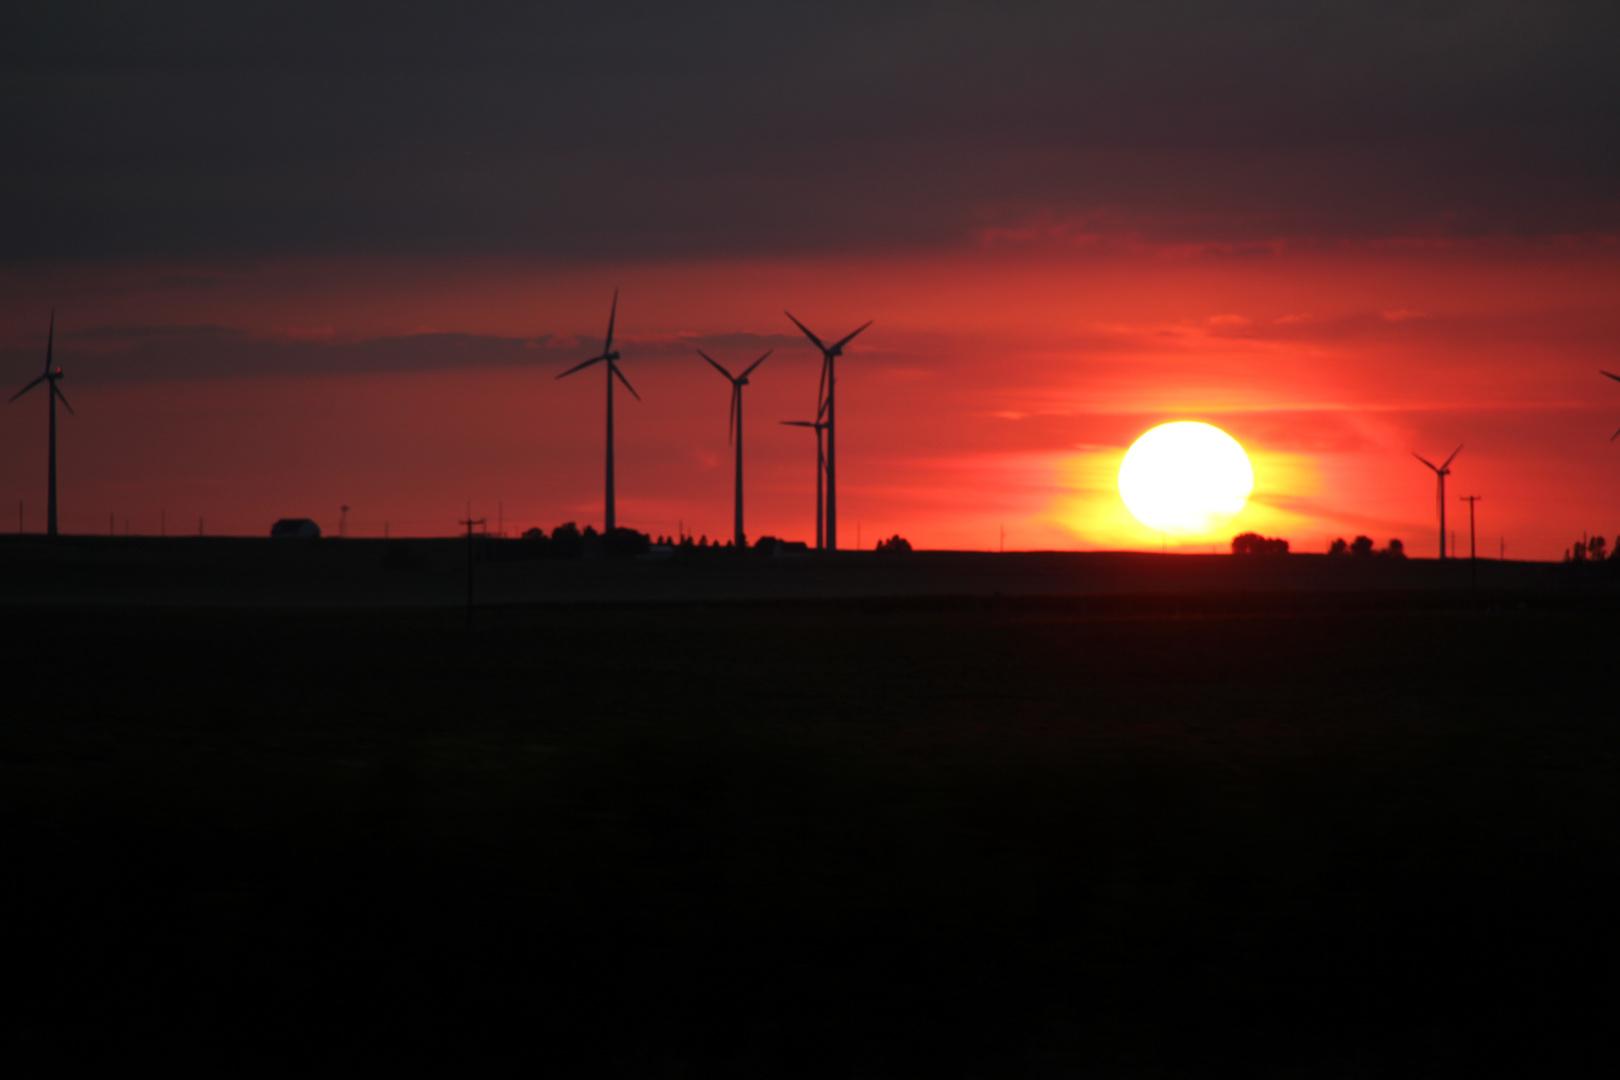 Sonnenuntergang in USA (Iowa)